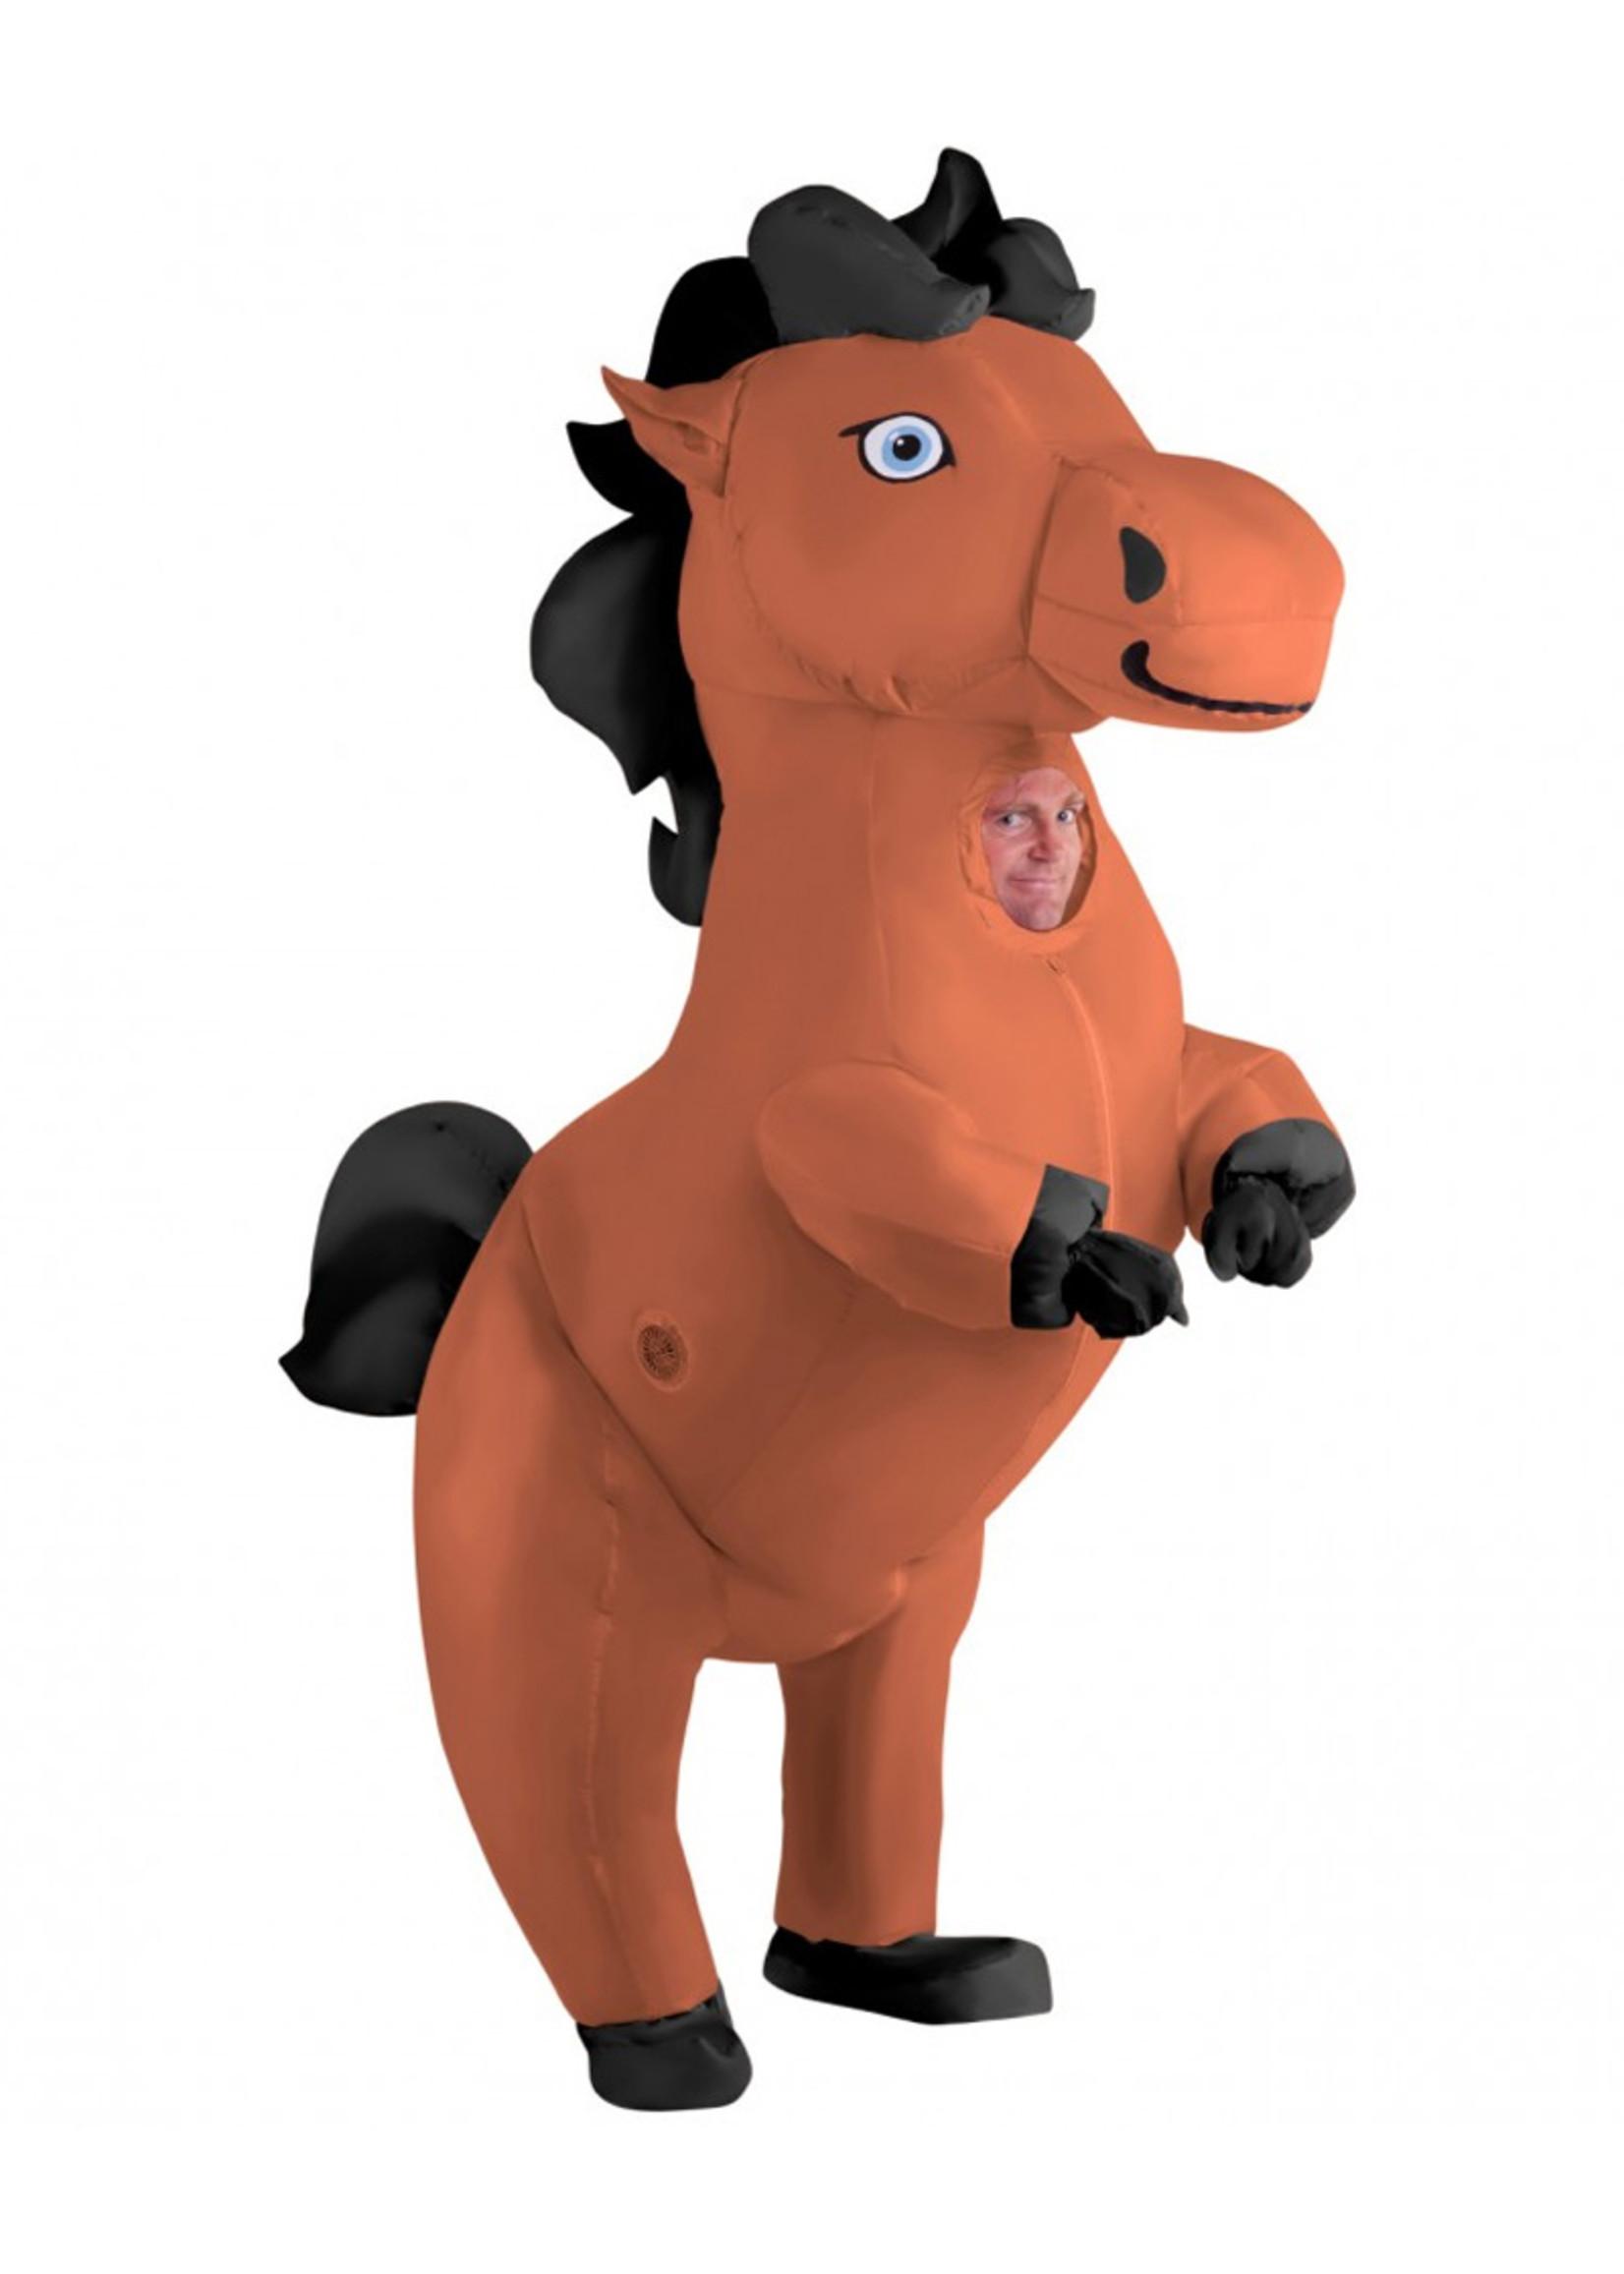 LOFTUS INTERNATIONAL Prancing Horse Inflatable - Adult